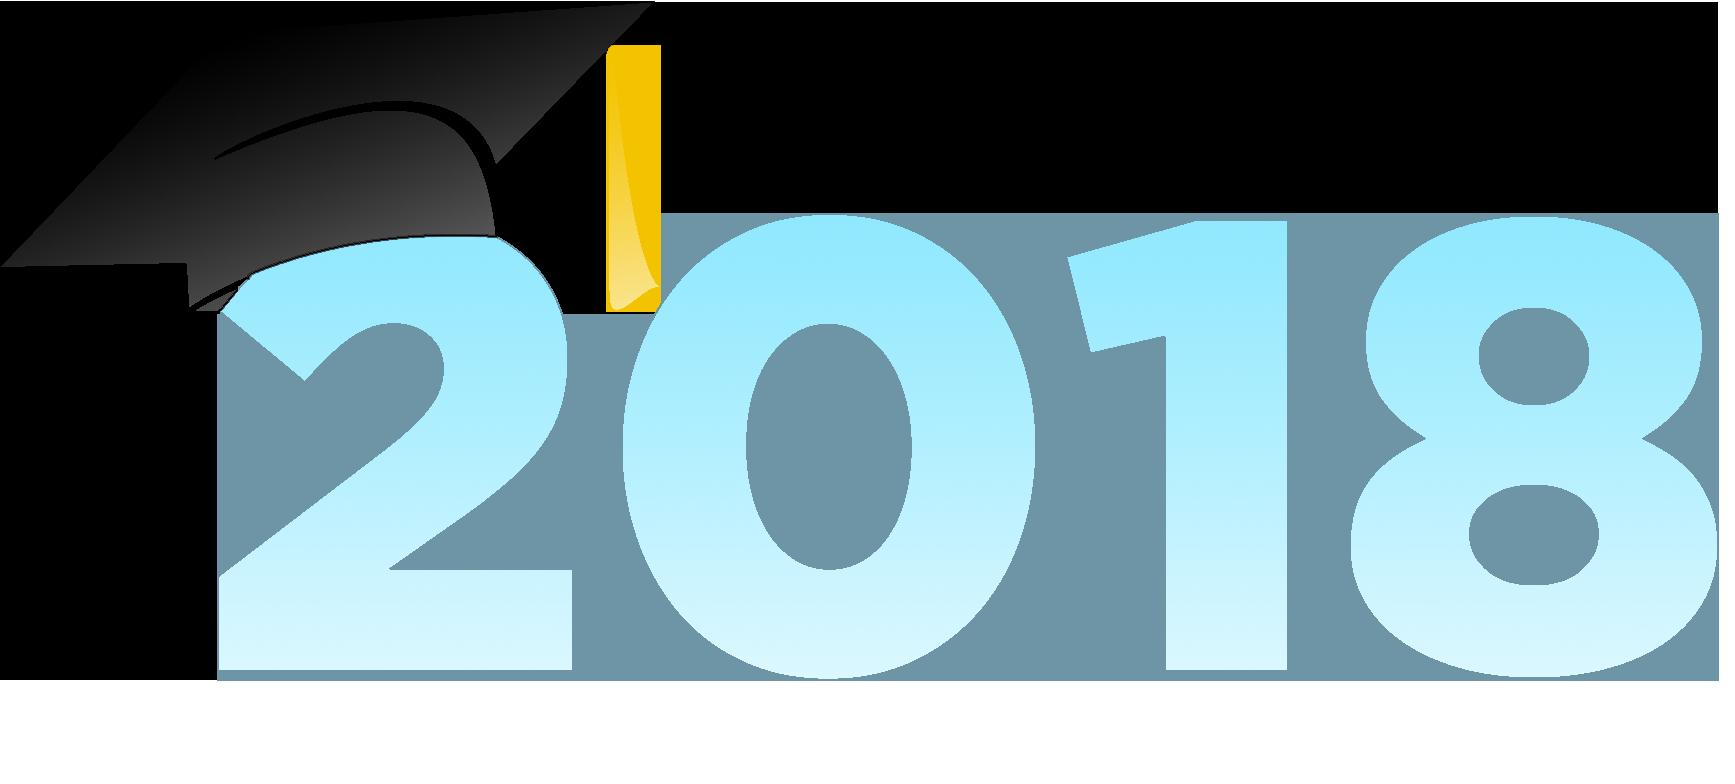 Graduation clipart university graduation.